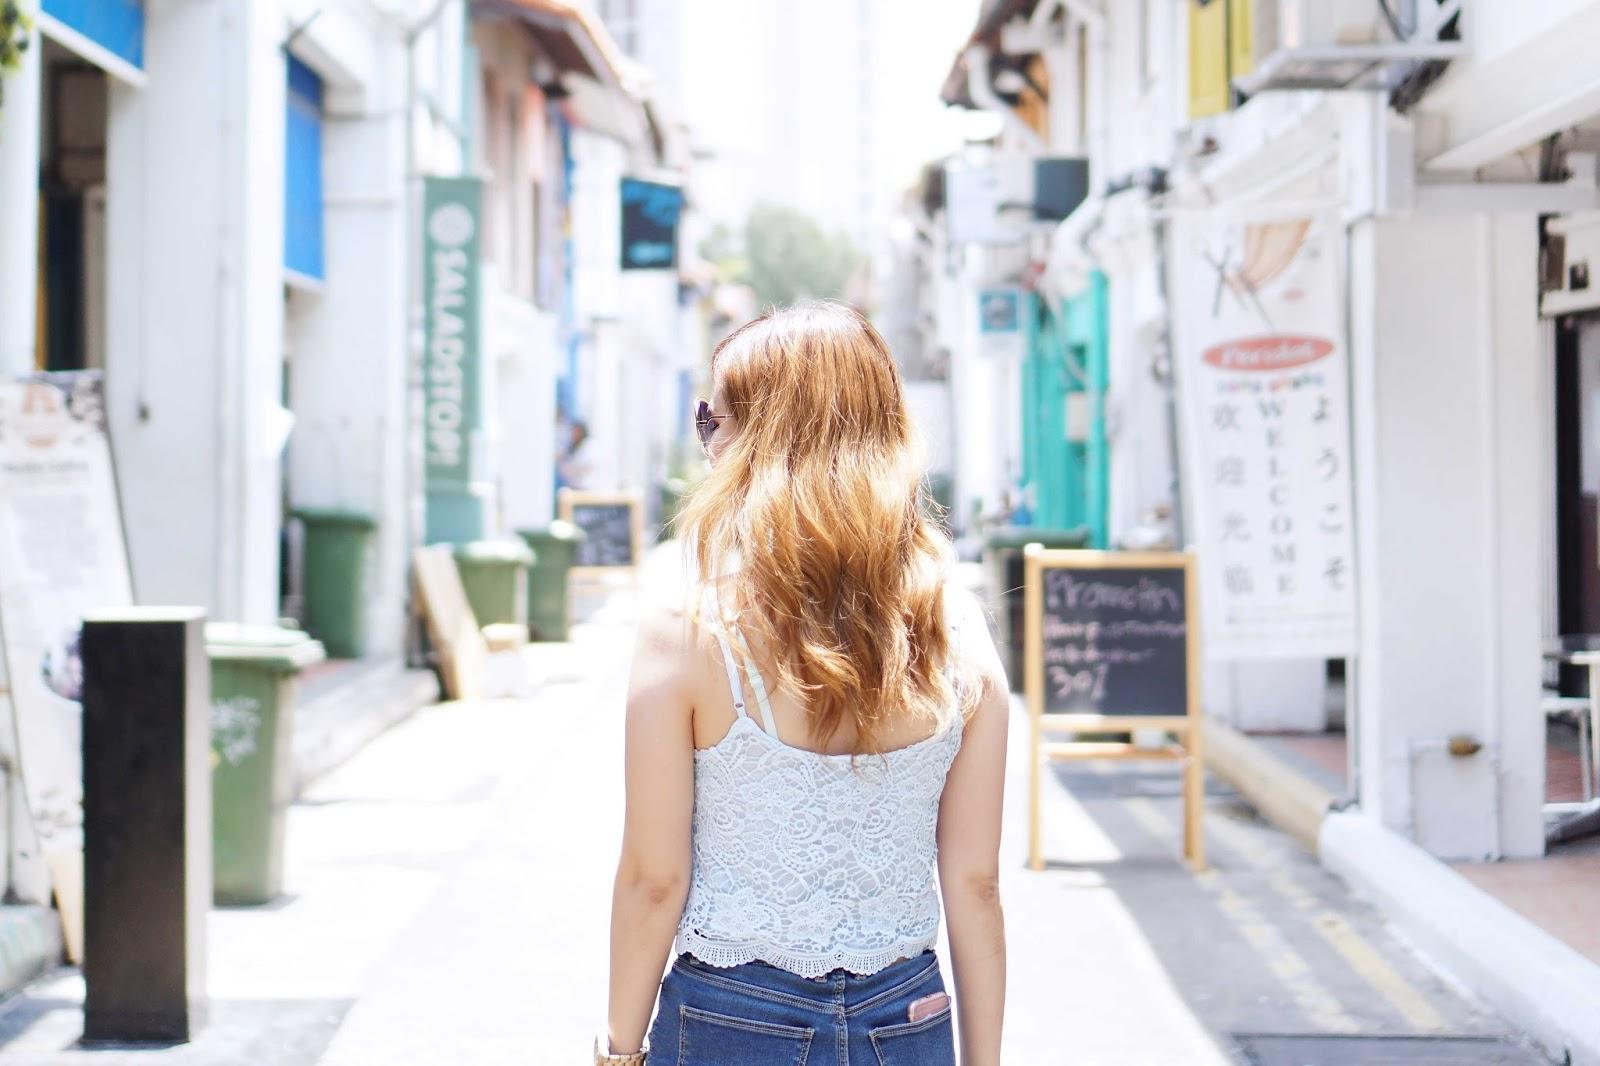 haji lane, singapore, travel with jeanmilka, jeanmilka in singapore, haji lane, travel, travel to singapore, wonderlust